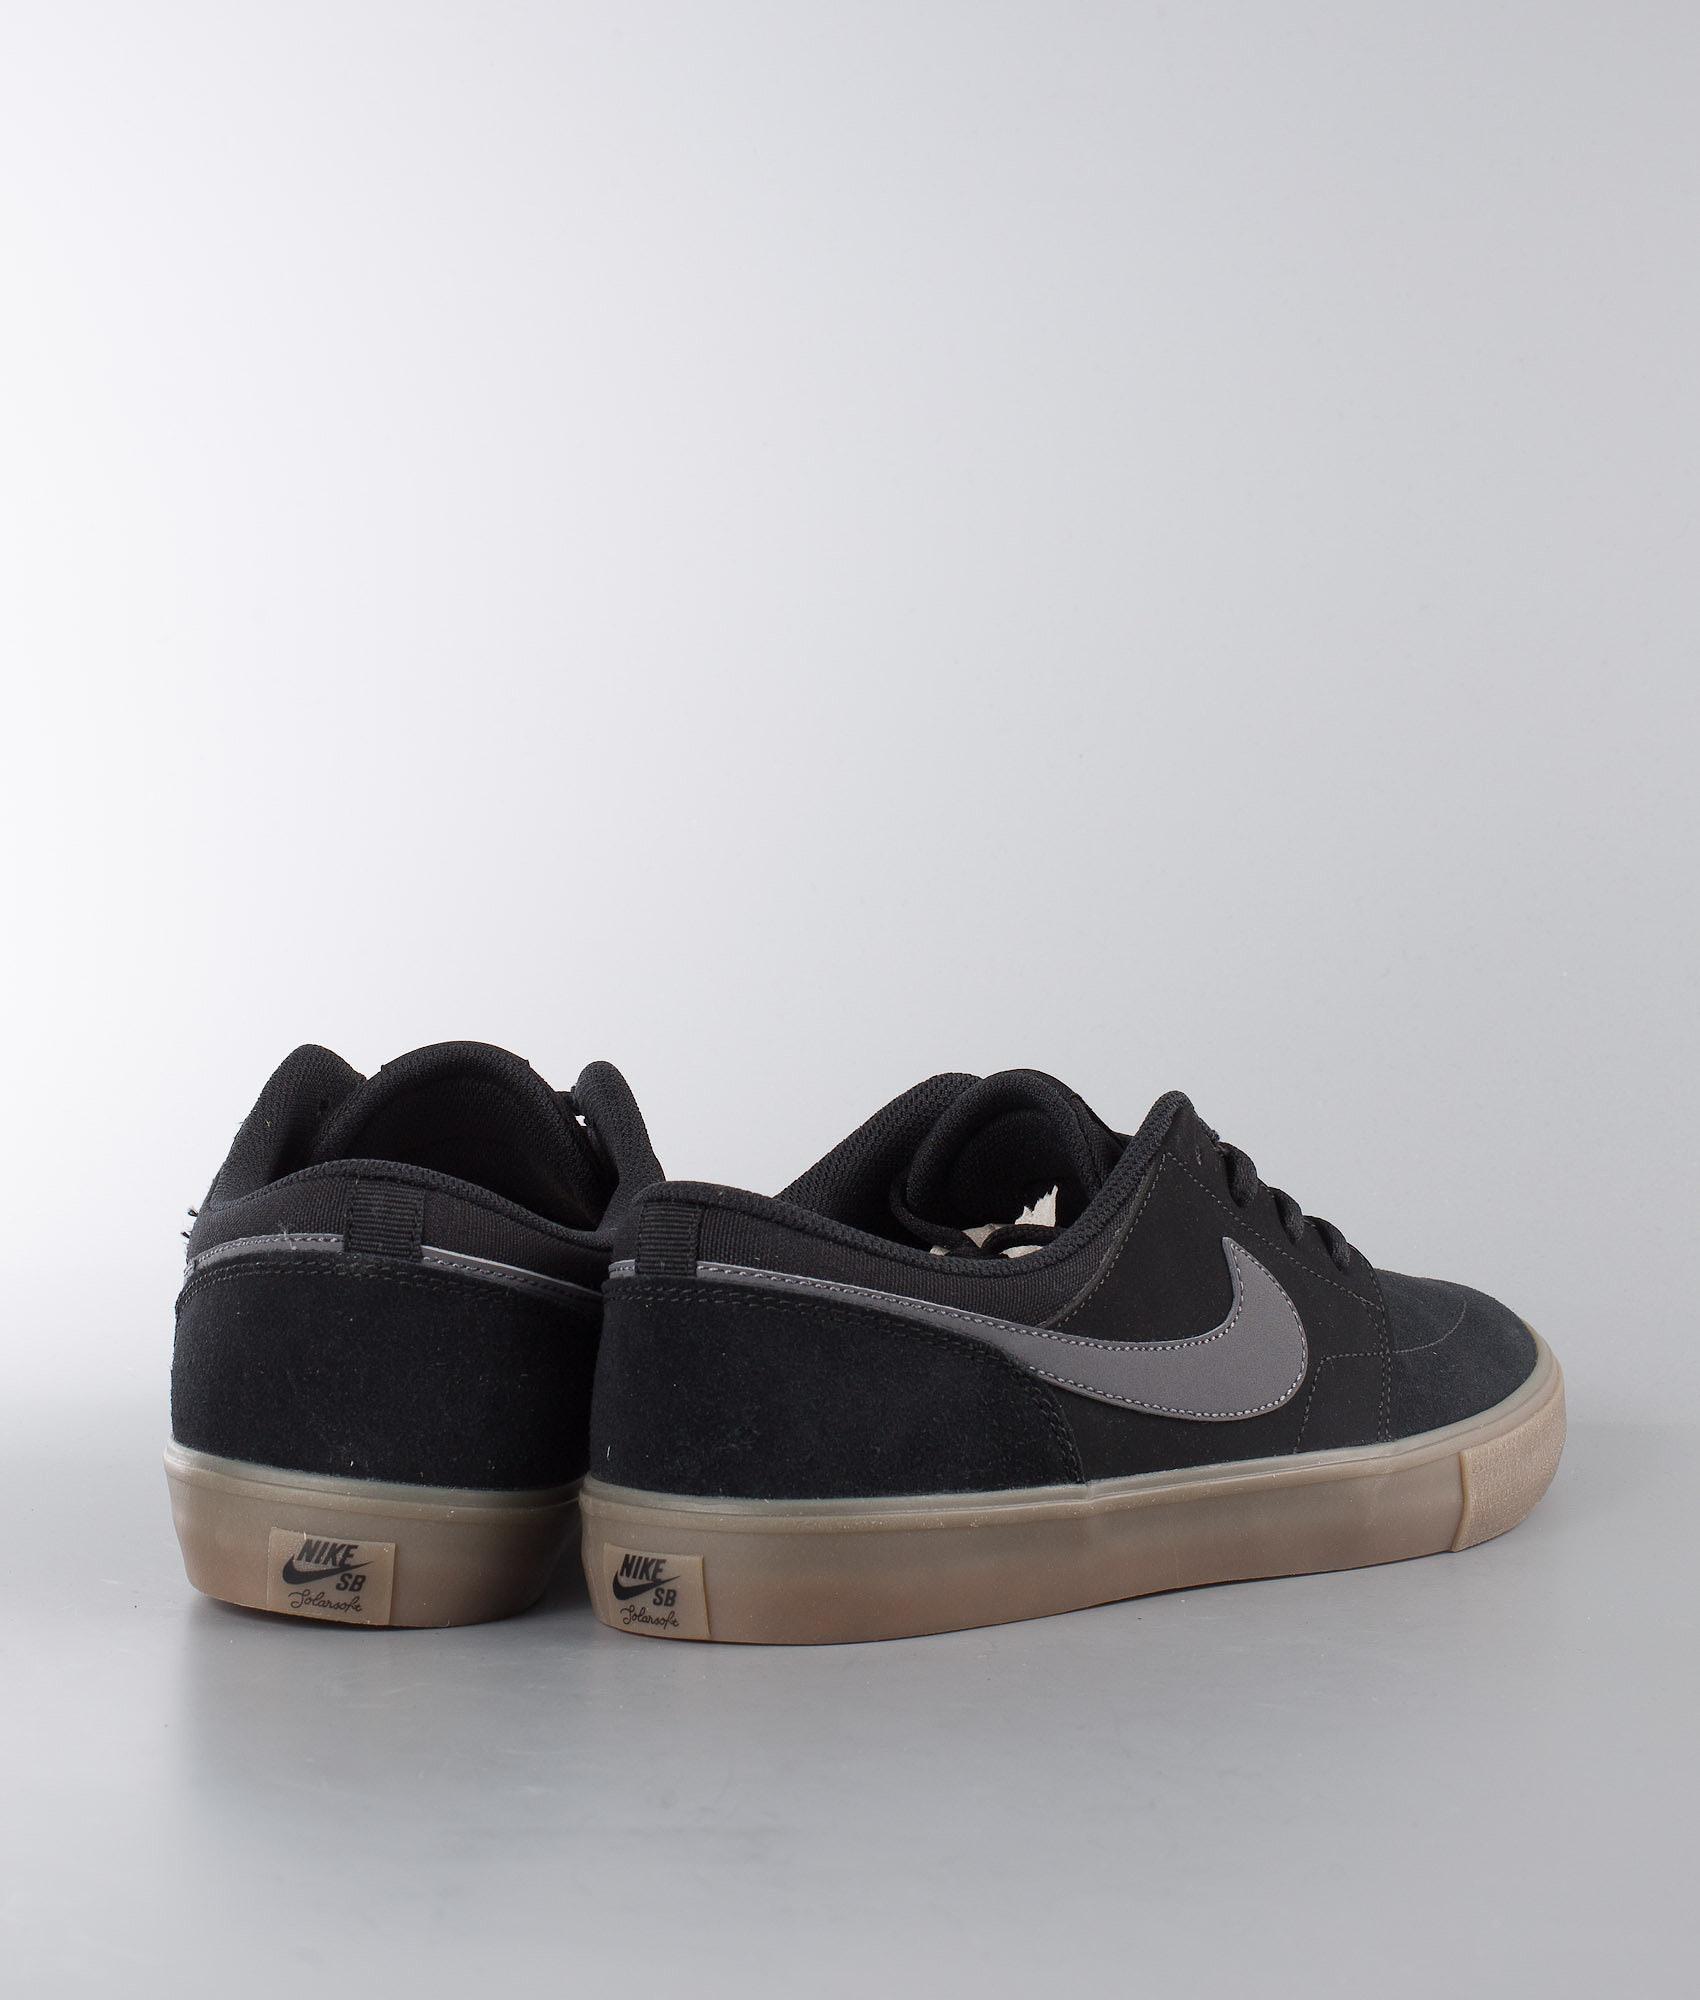 a349b4f5db241 Nike Portmore II Solar Shoes Black/Dark Grey-Gum Light Brown